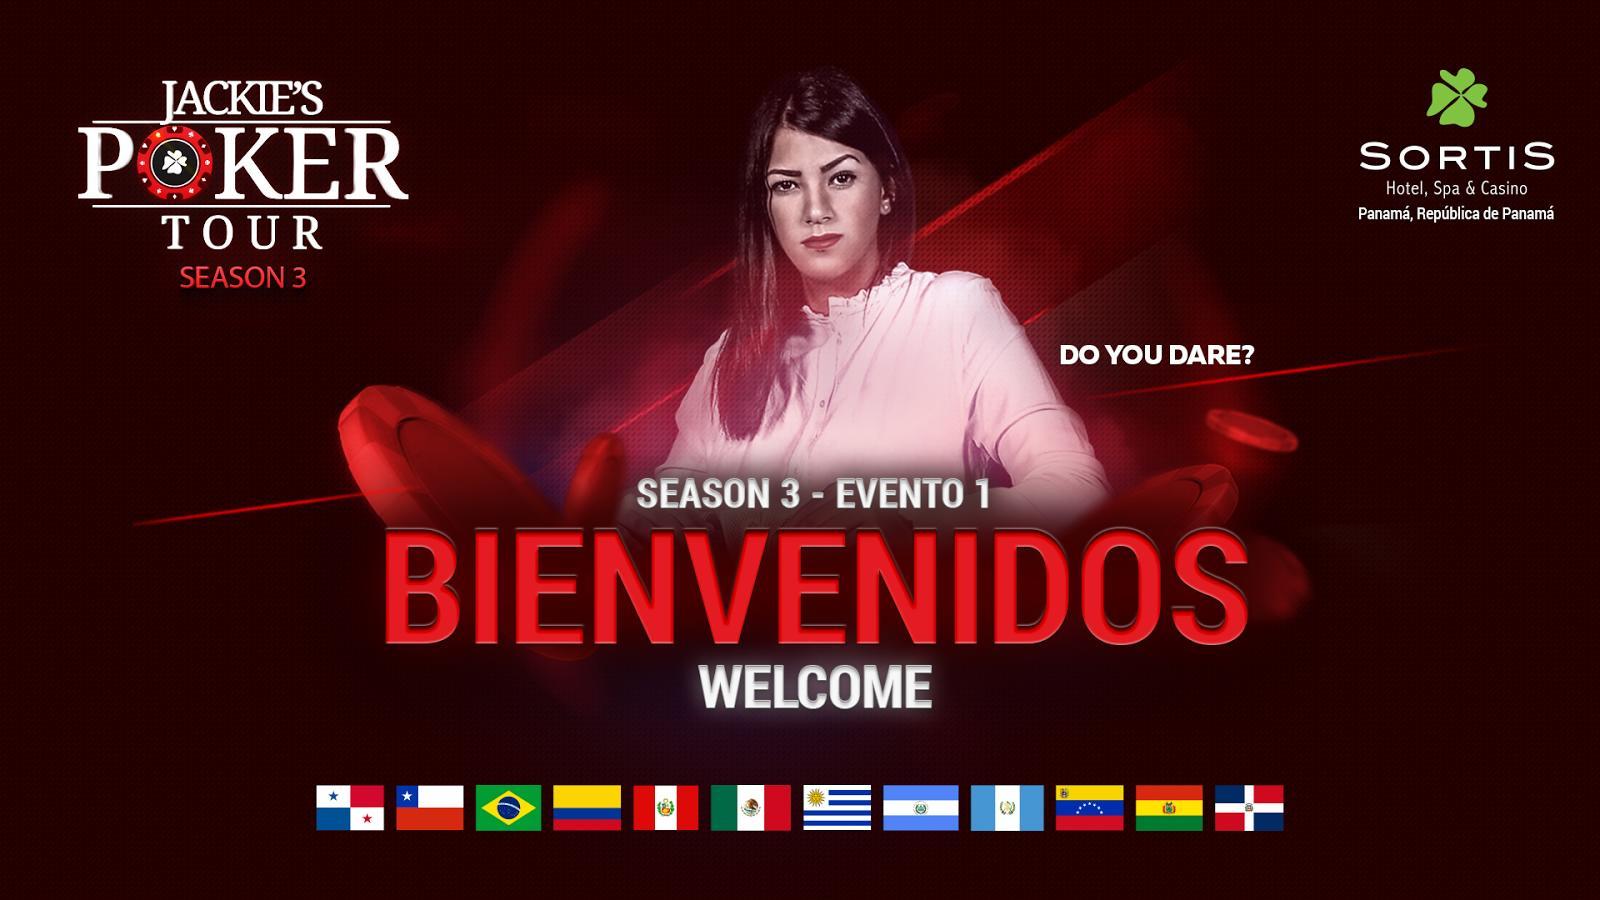 Jackies Poker Tour Season 3 - Event 1